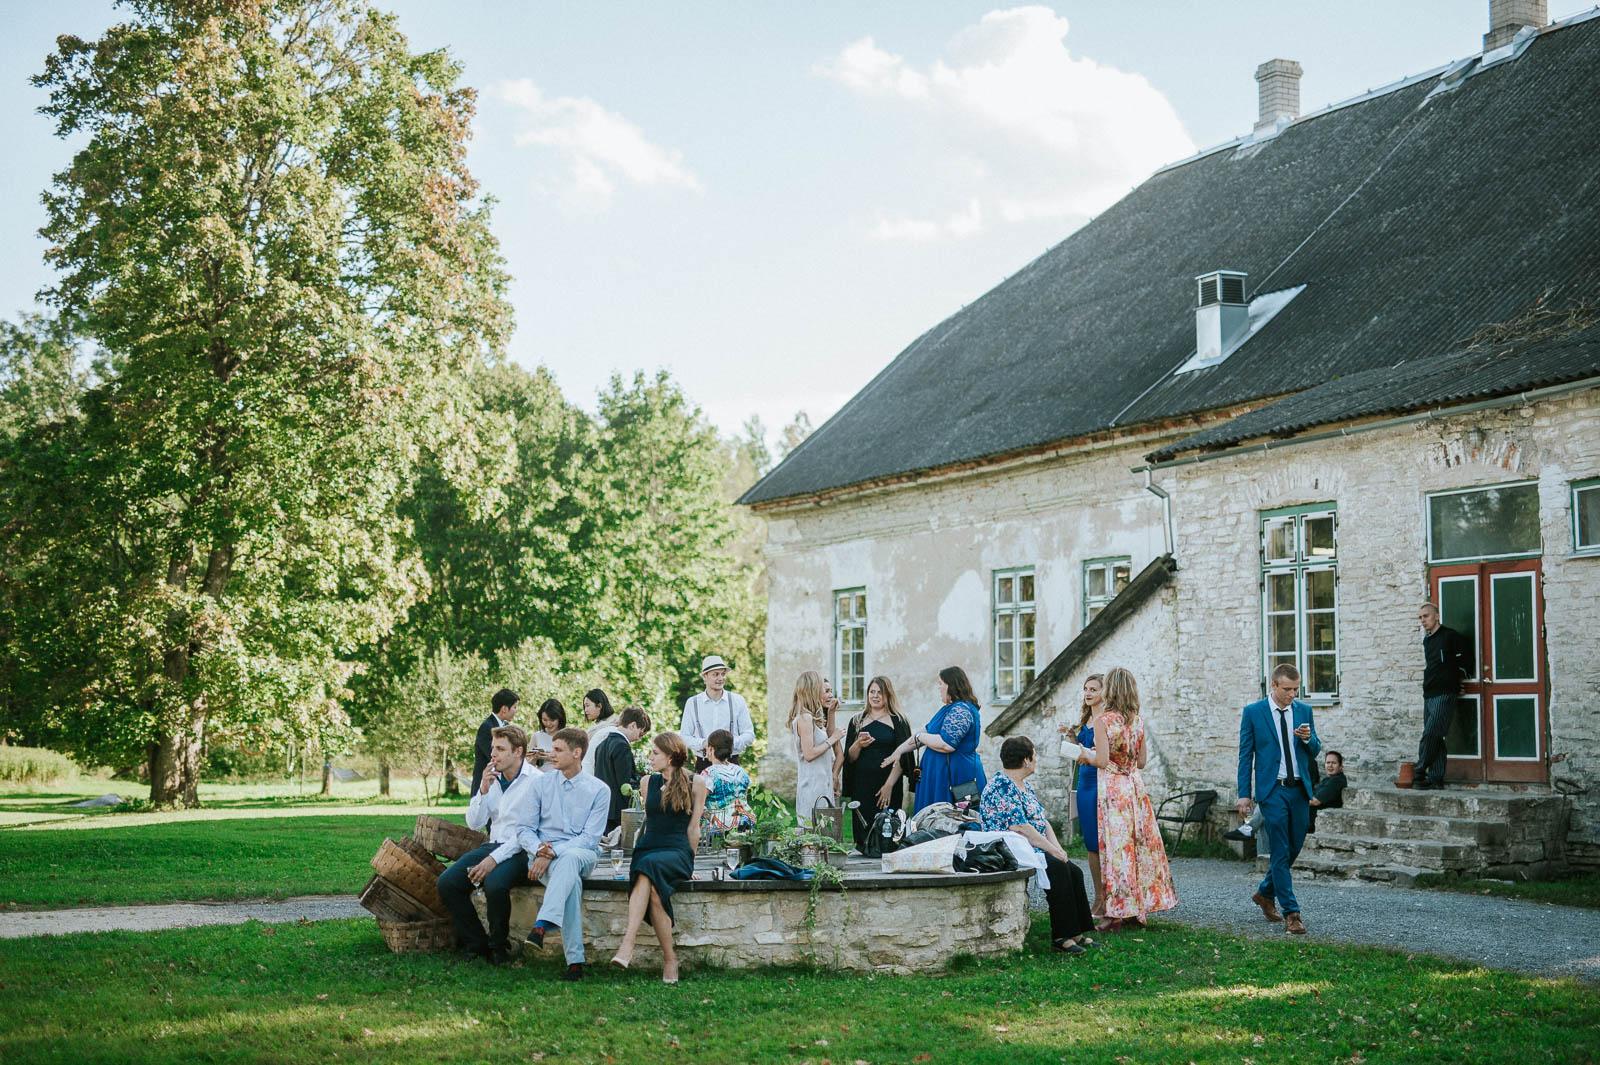 Pohjaka_mois_manor_pulm_wedding_Mait_Juriado-31